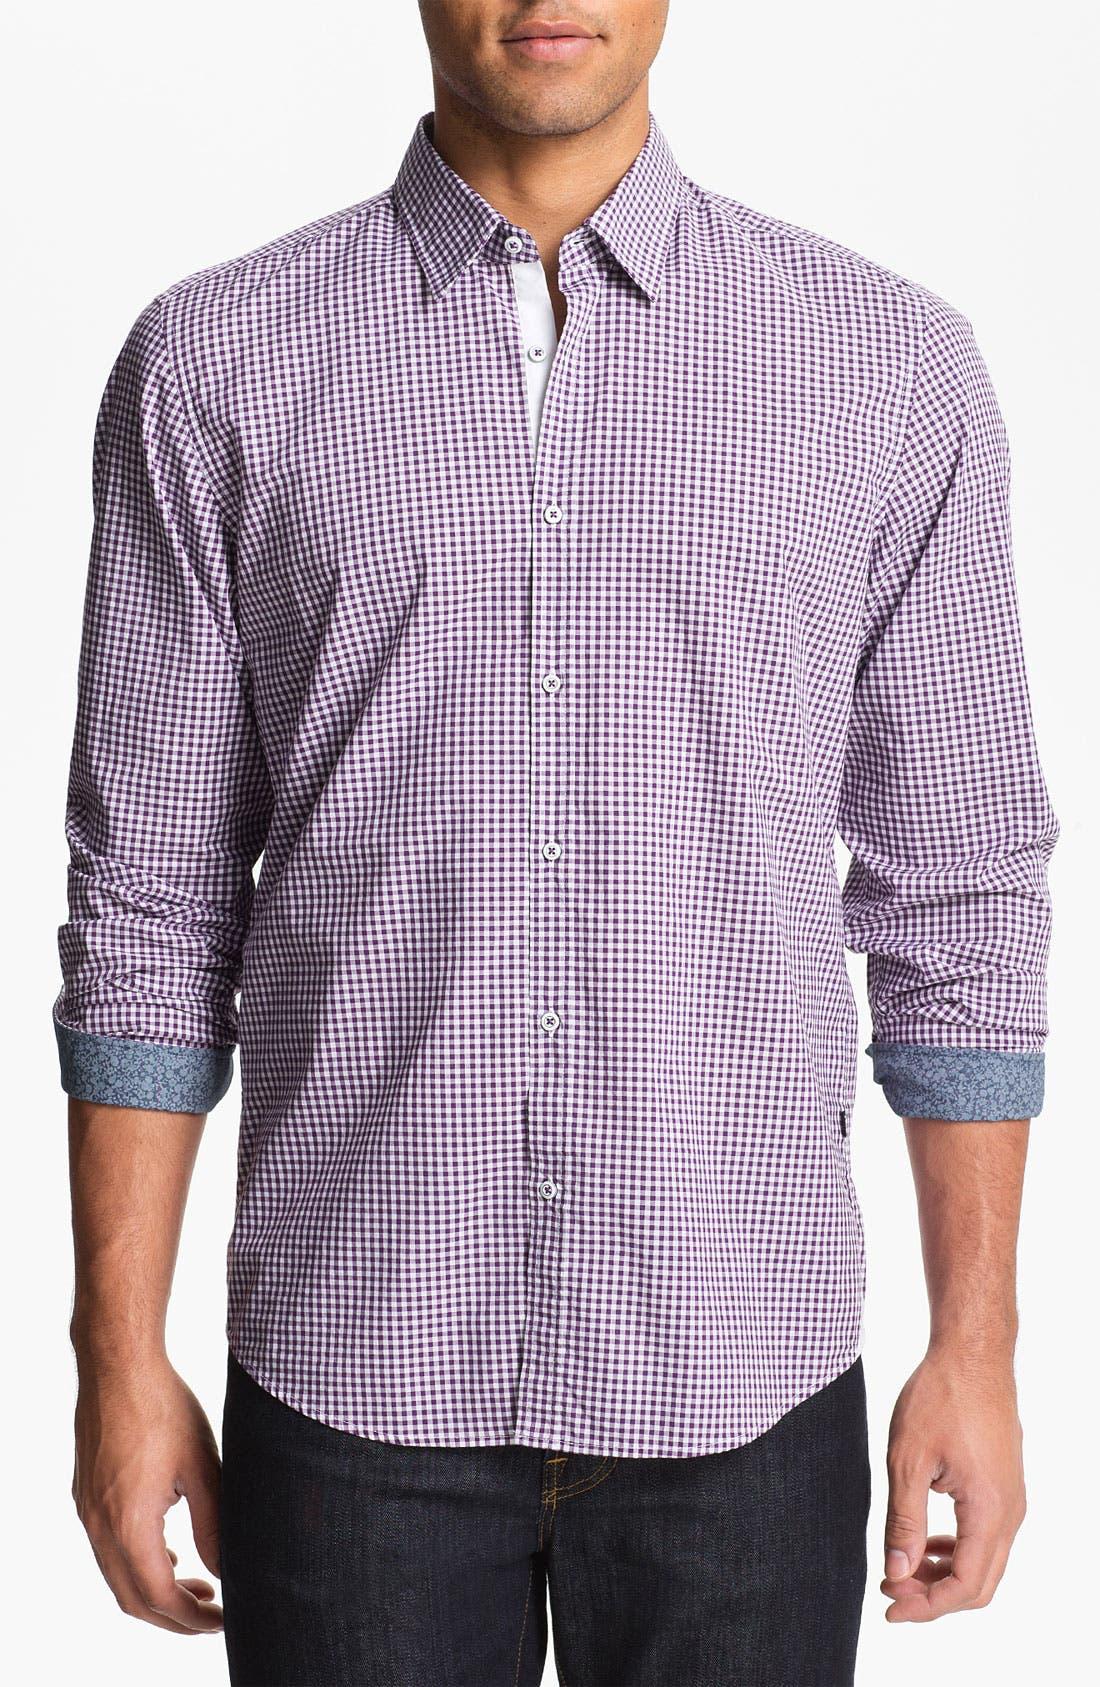 Alternate Image 1 Selected - BOSS HUGO BOSS 'Obert' Regular Fit Sport Shirt